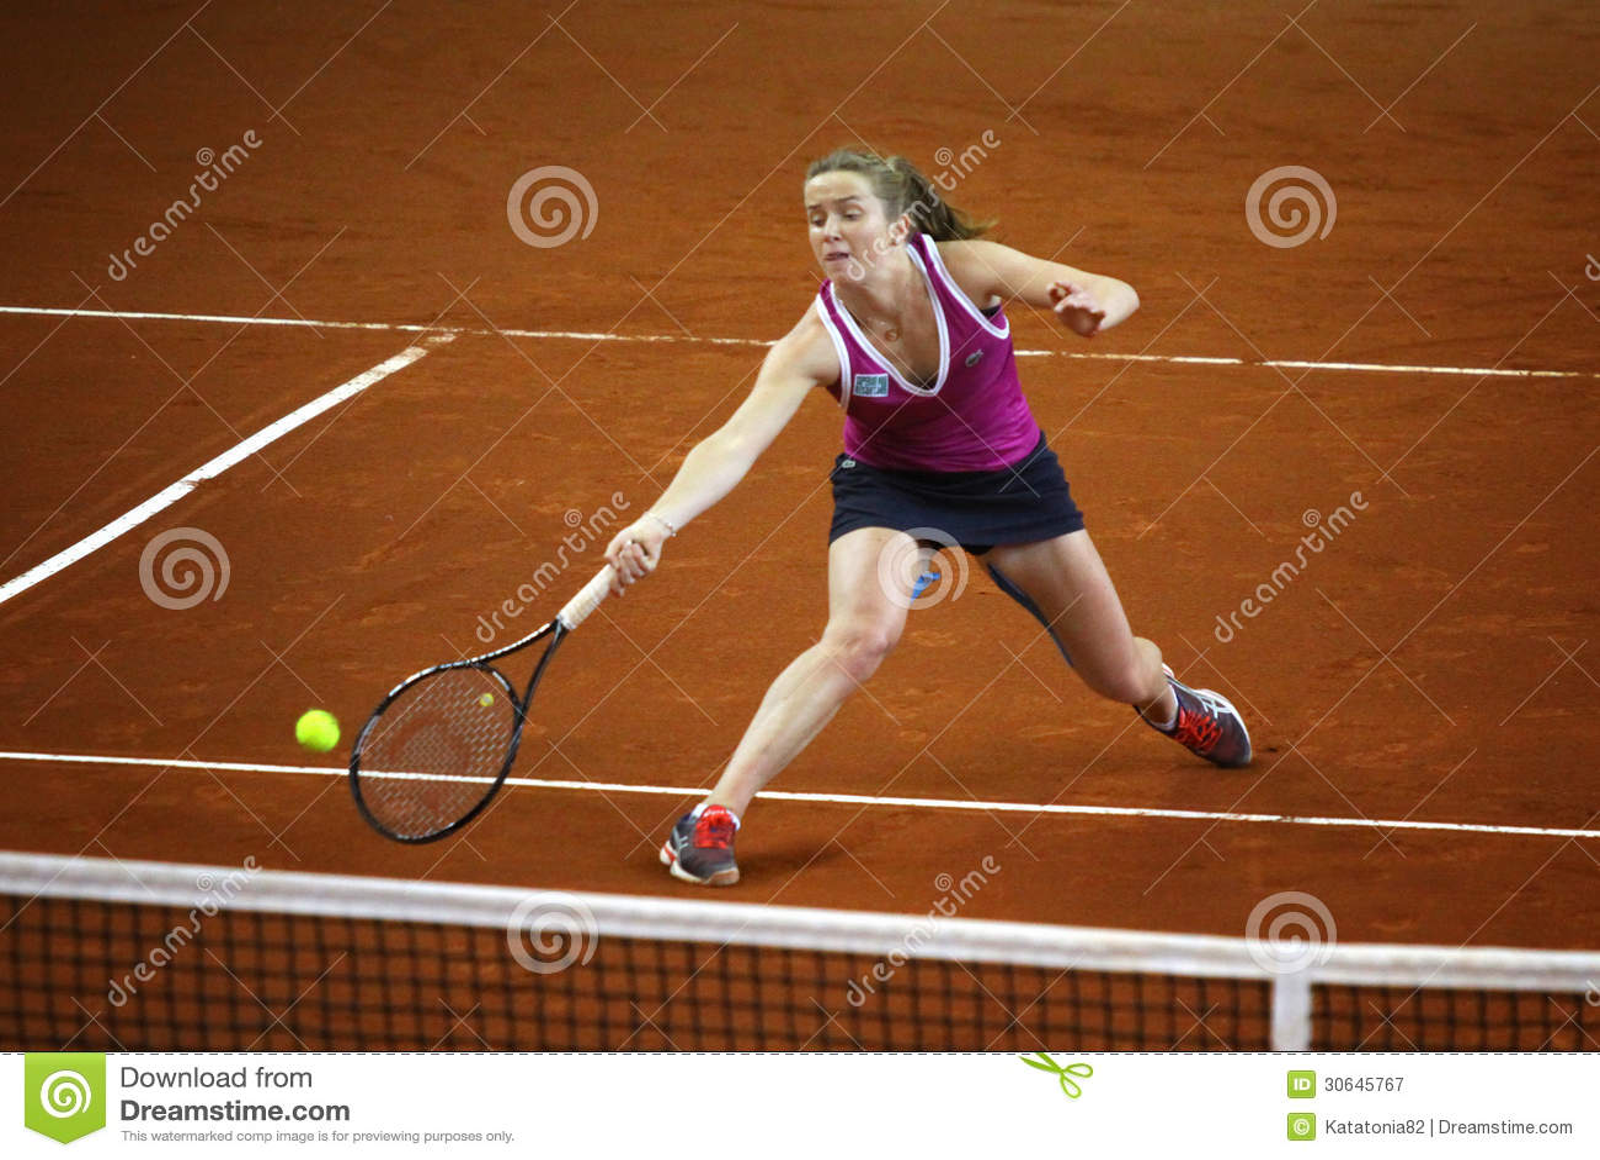 fedcup tennis game ukraine vs canada editorial photography image 30645767. Black Bedroom Furniture Sets. Home Design Ideas